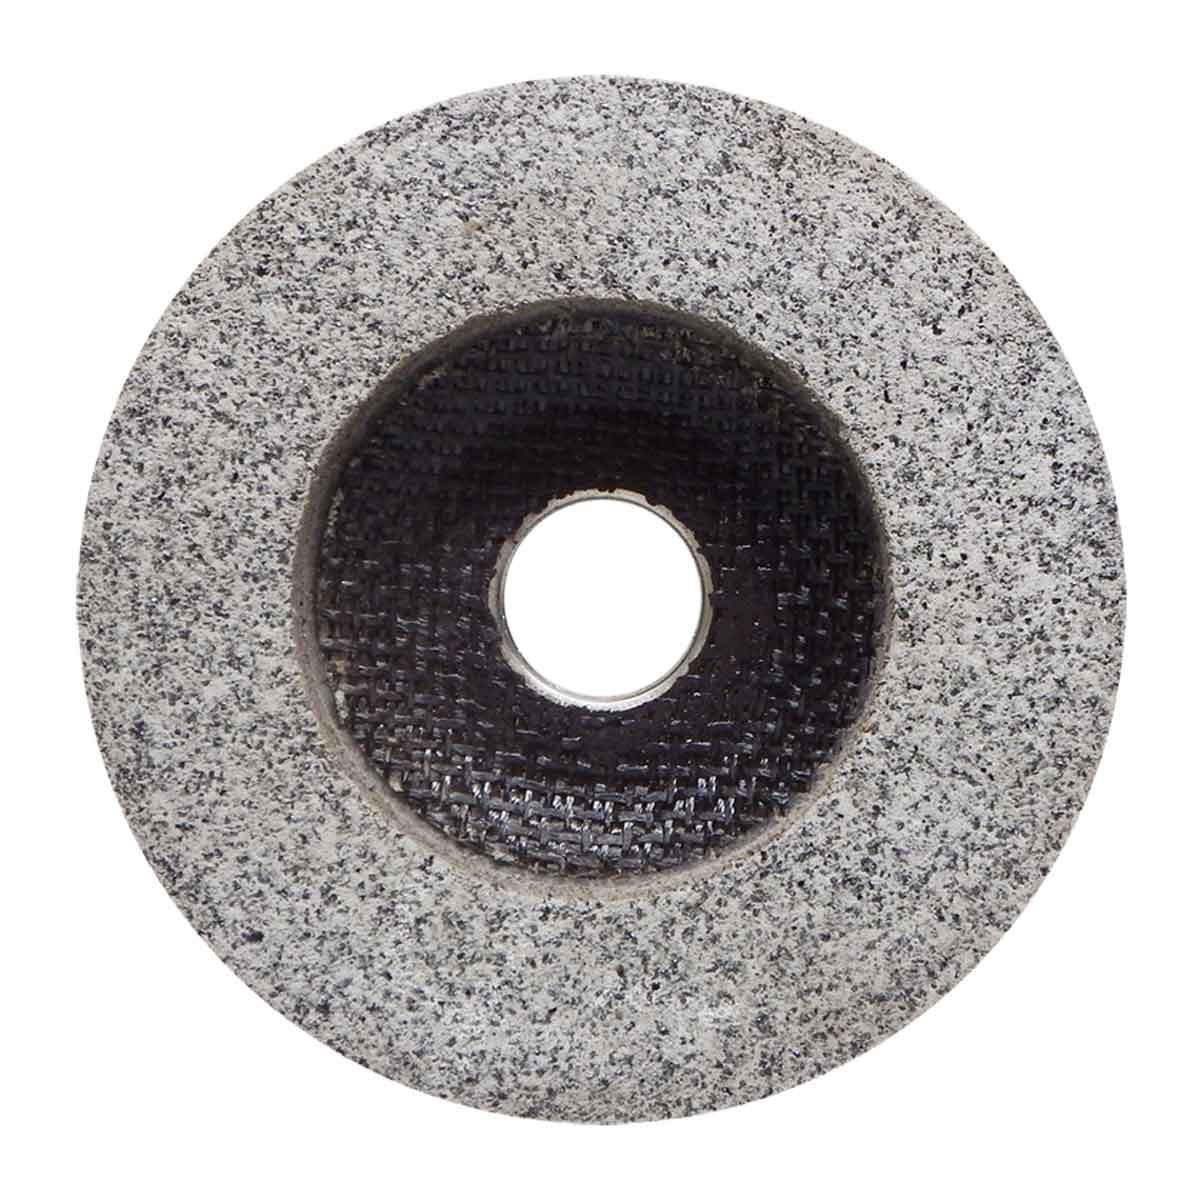 Alpha Tools PVA VP Dry Polishing Disc - Extra Coarse Grit